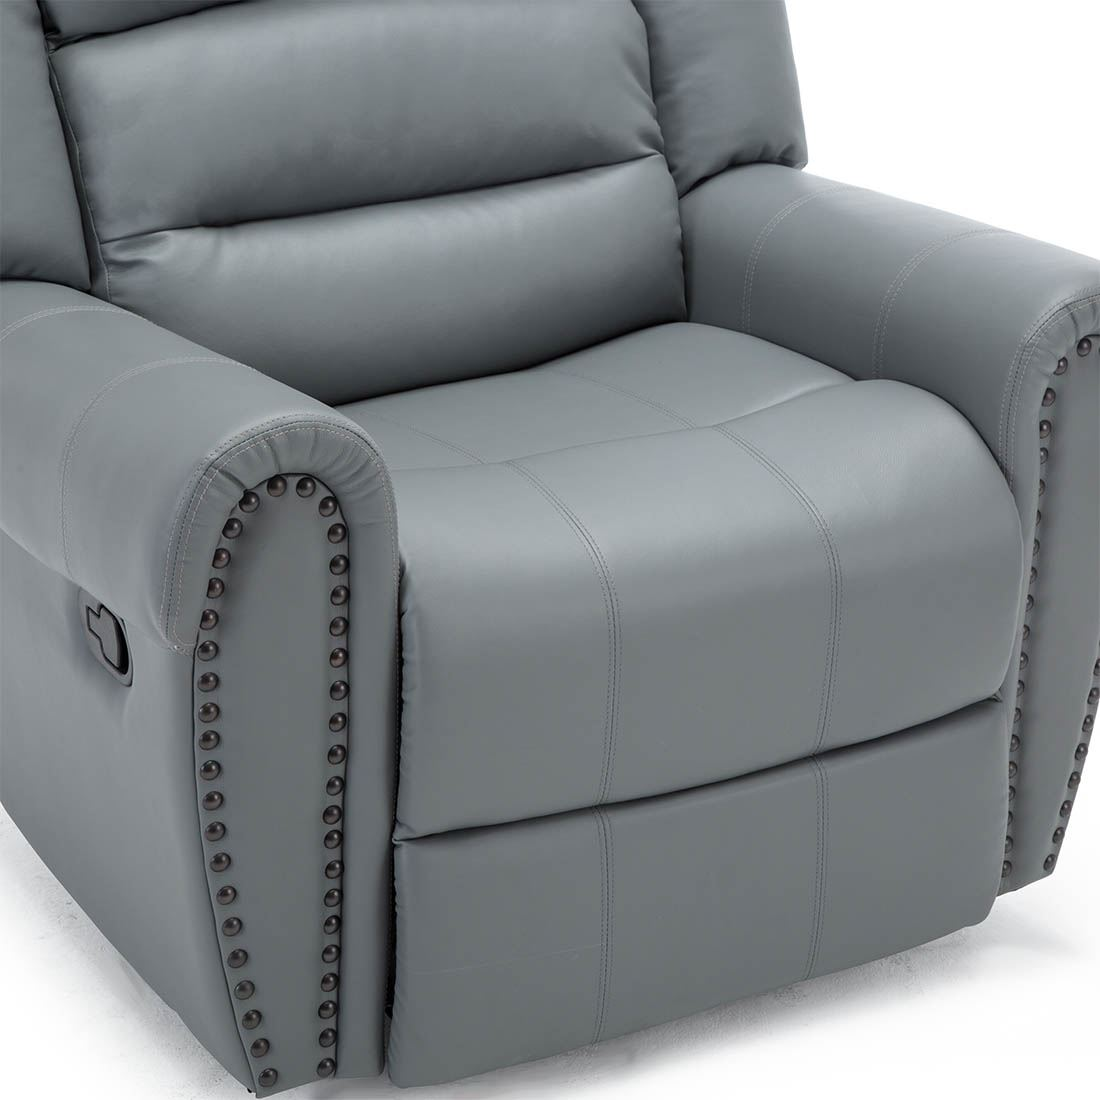 Denver Recliner Sofa: DENVER BONDED LEATHER RECLINER ARMCHAIR STUD SOFA HOME